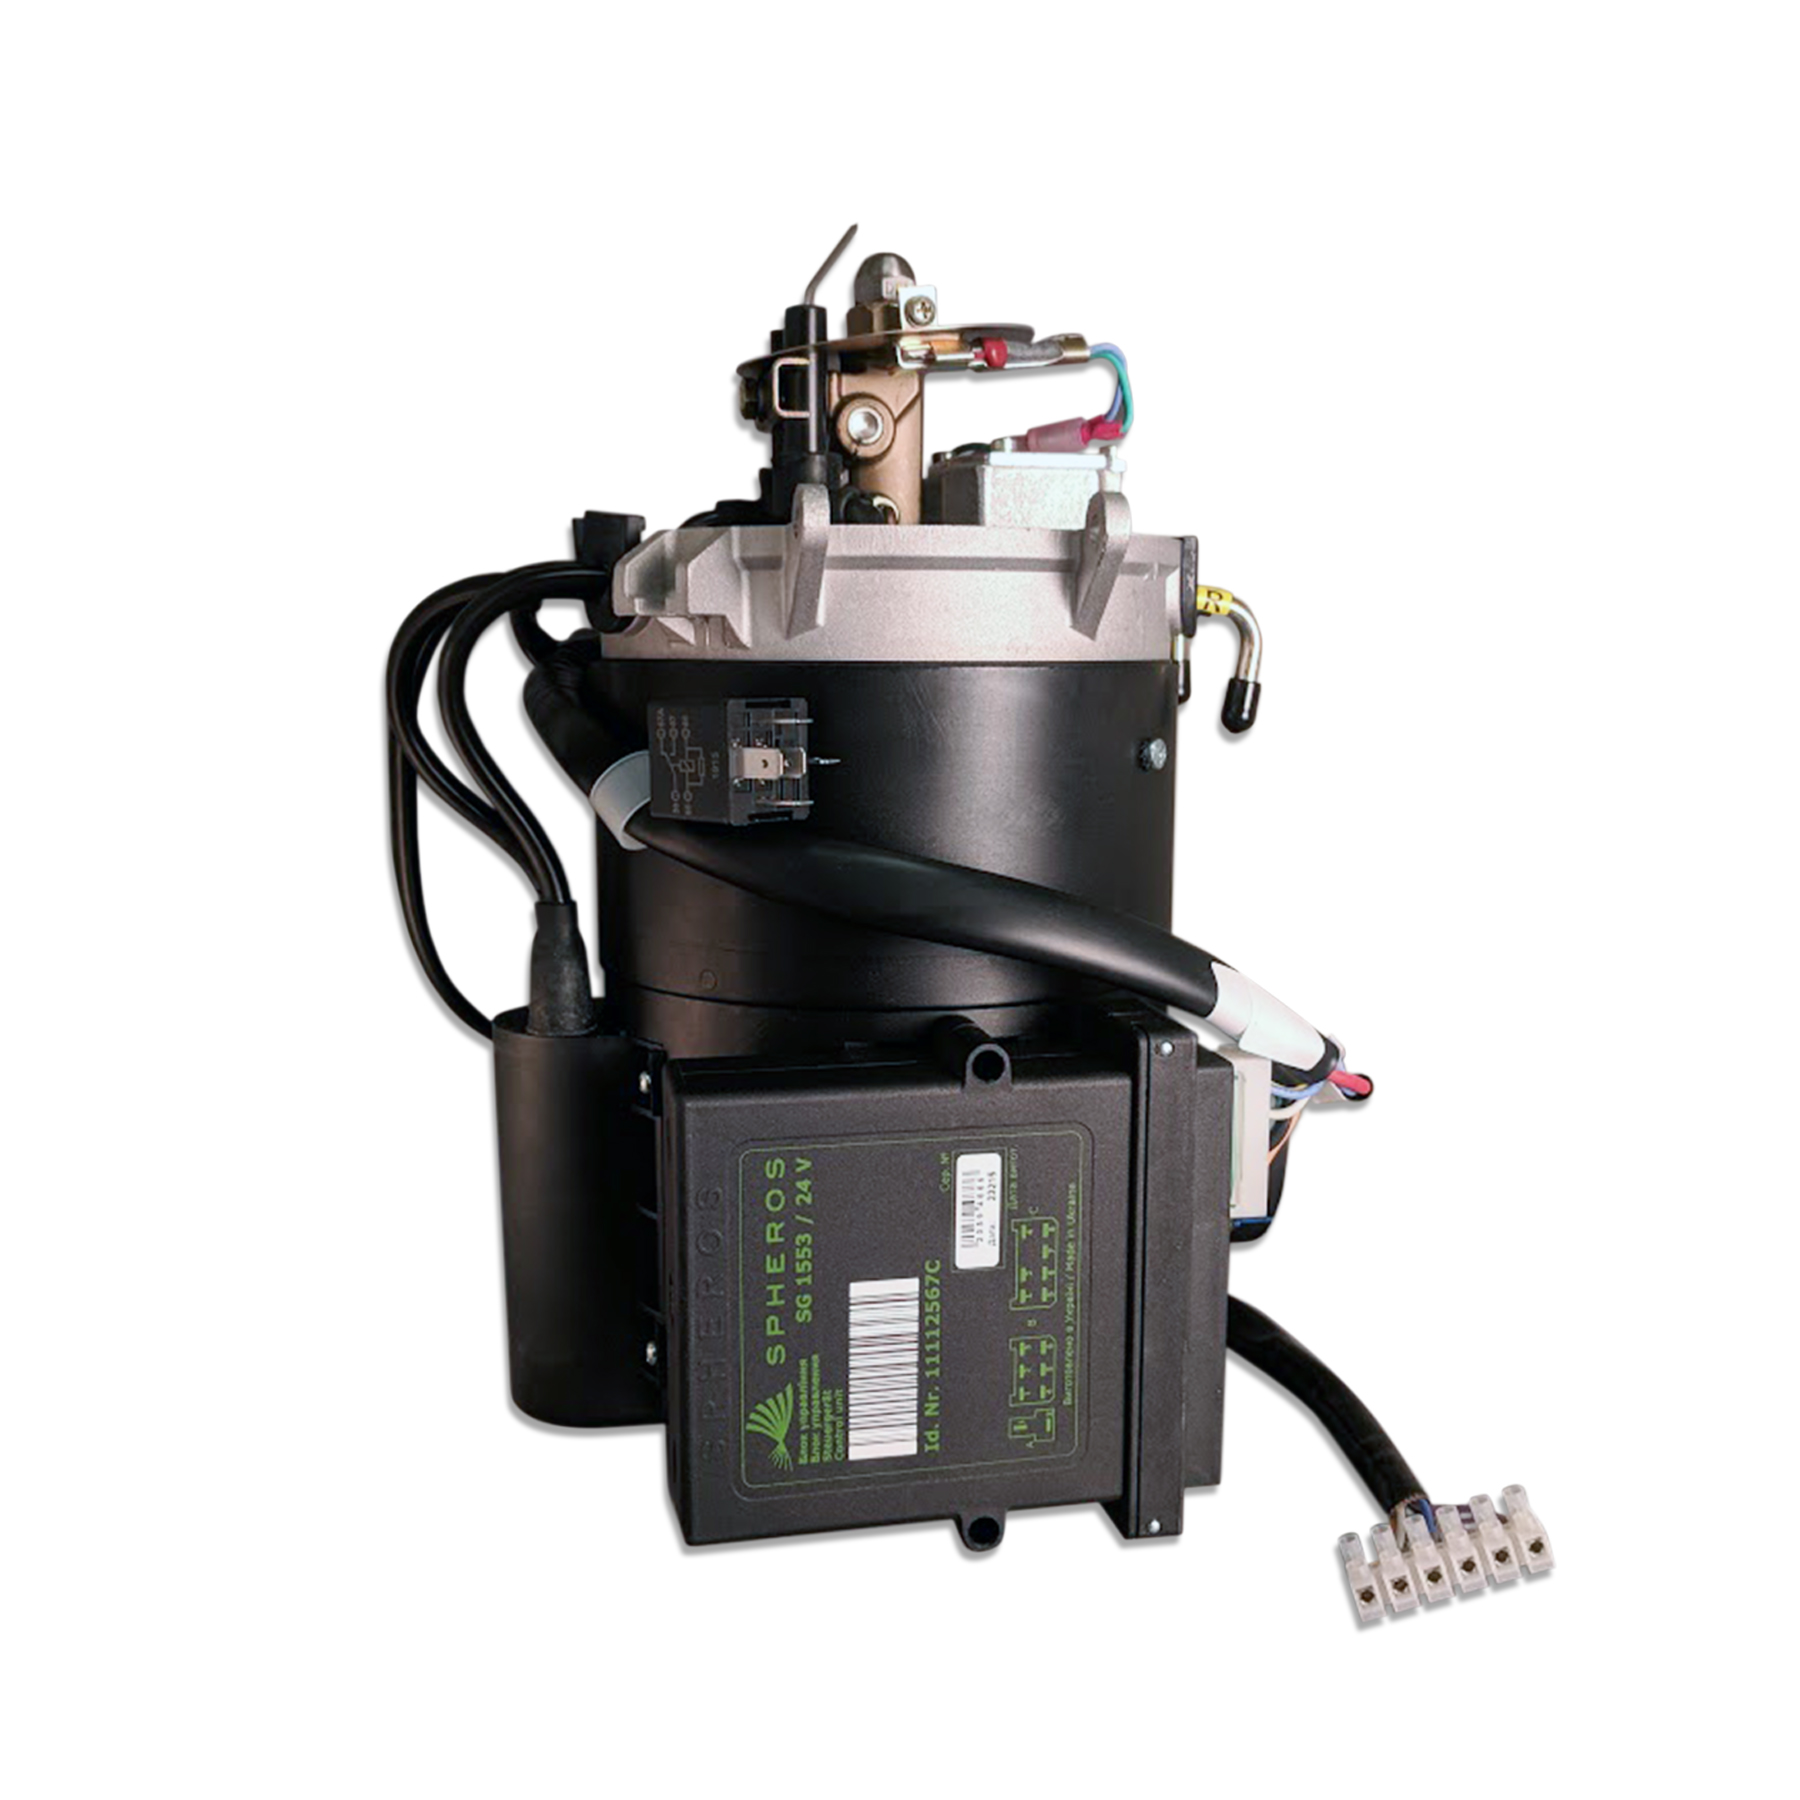 24 VDC Unmodified Diesel Burner, DBW-2010